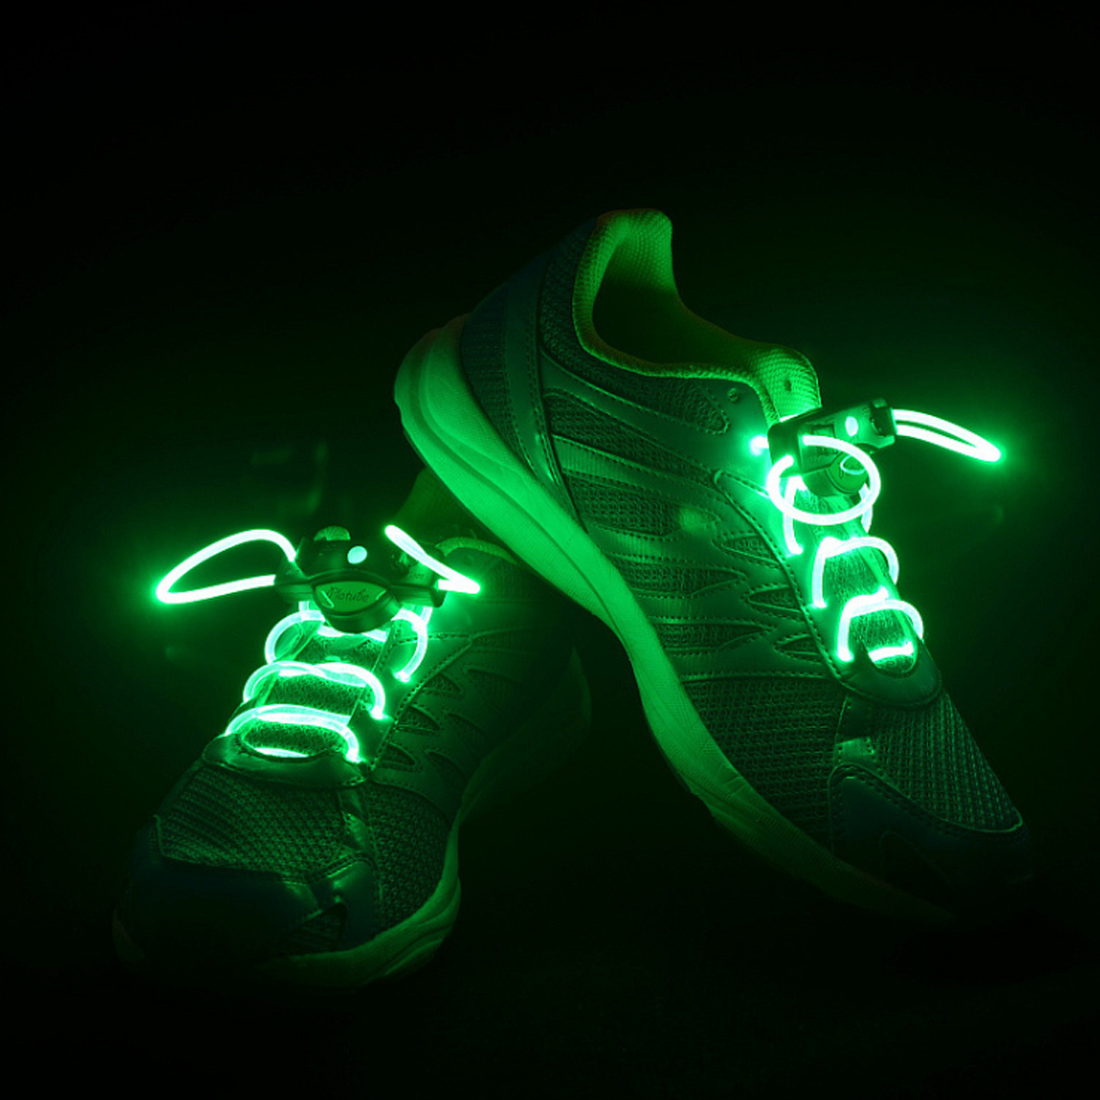 New  2pcs! Fashion LED Shoelaces Shoe Laces Flashing Light Up Glow Stick Strap Neon Shoe Strings Luminous Laces Disco Party